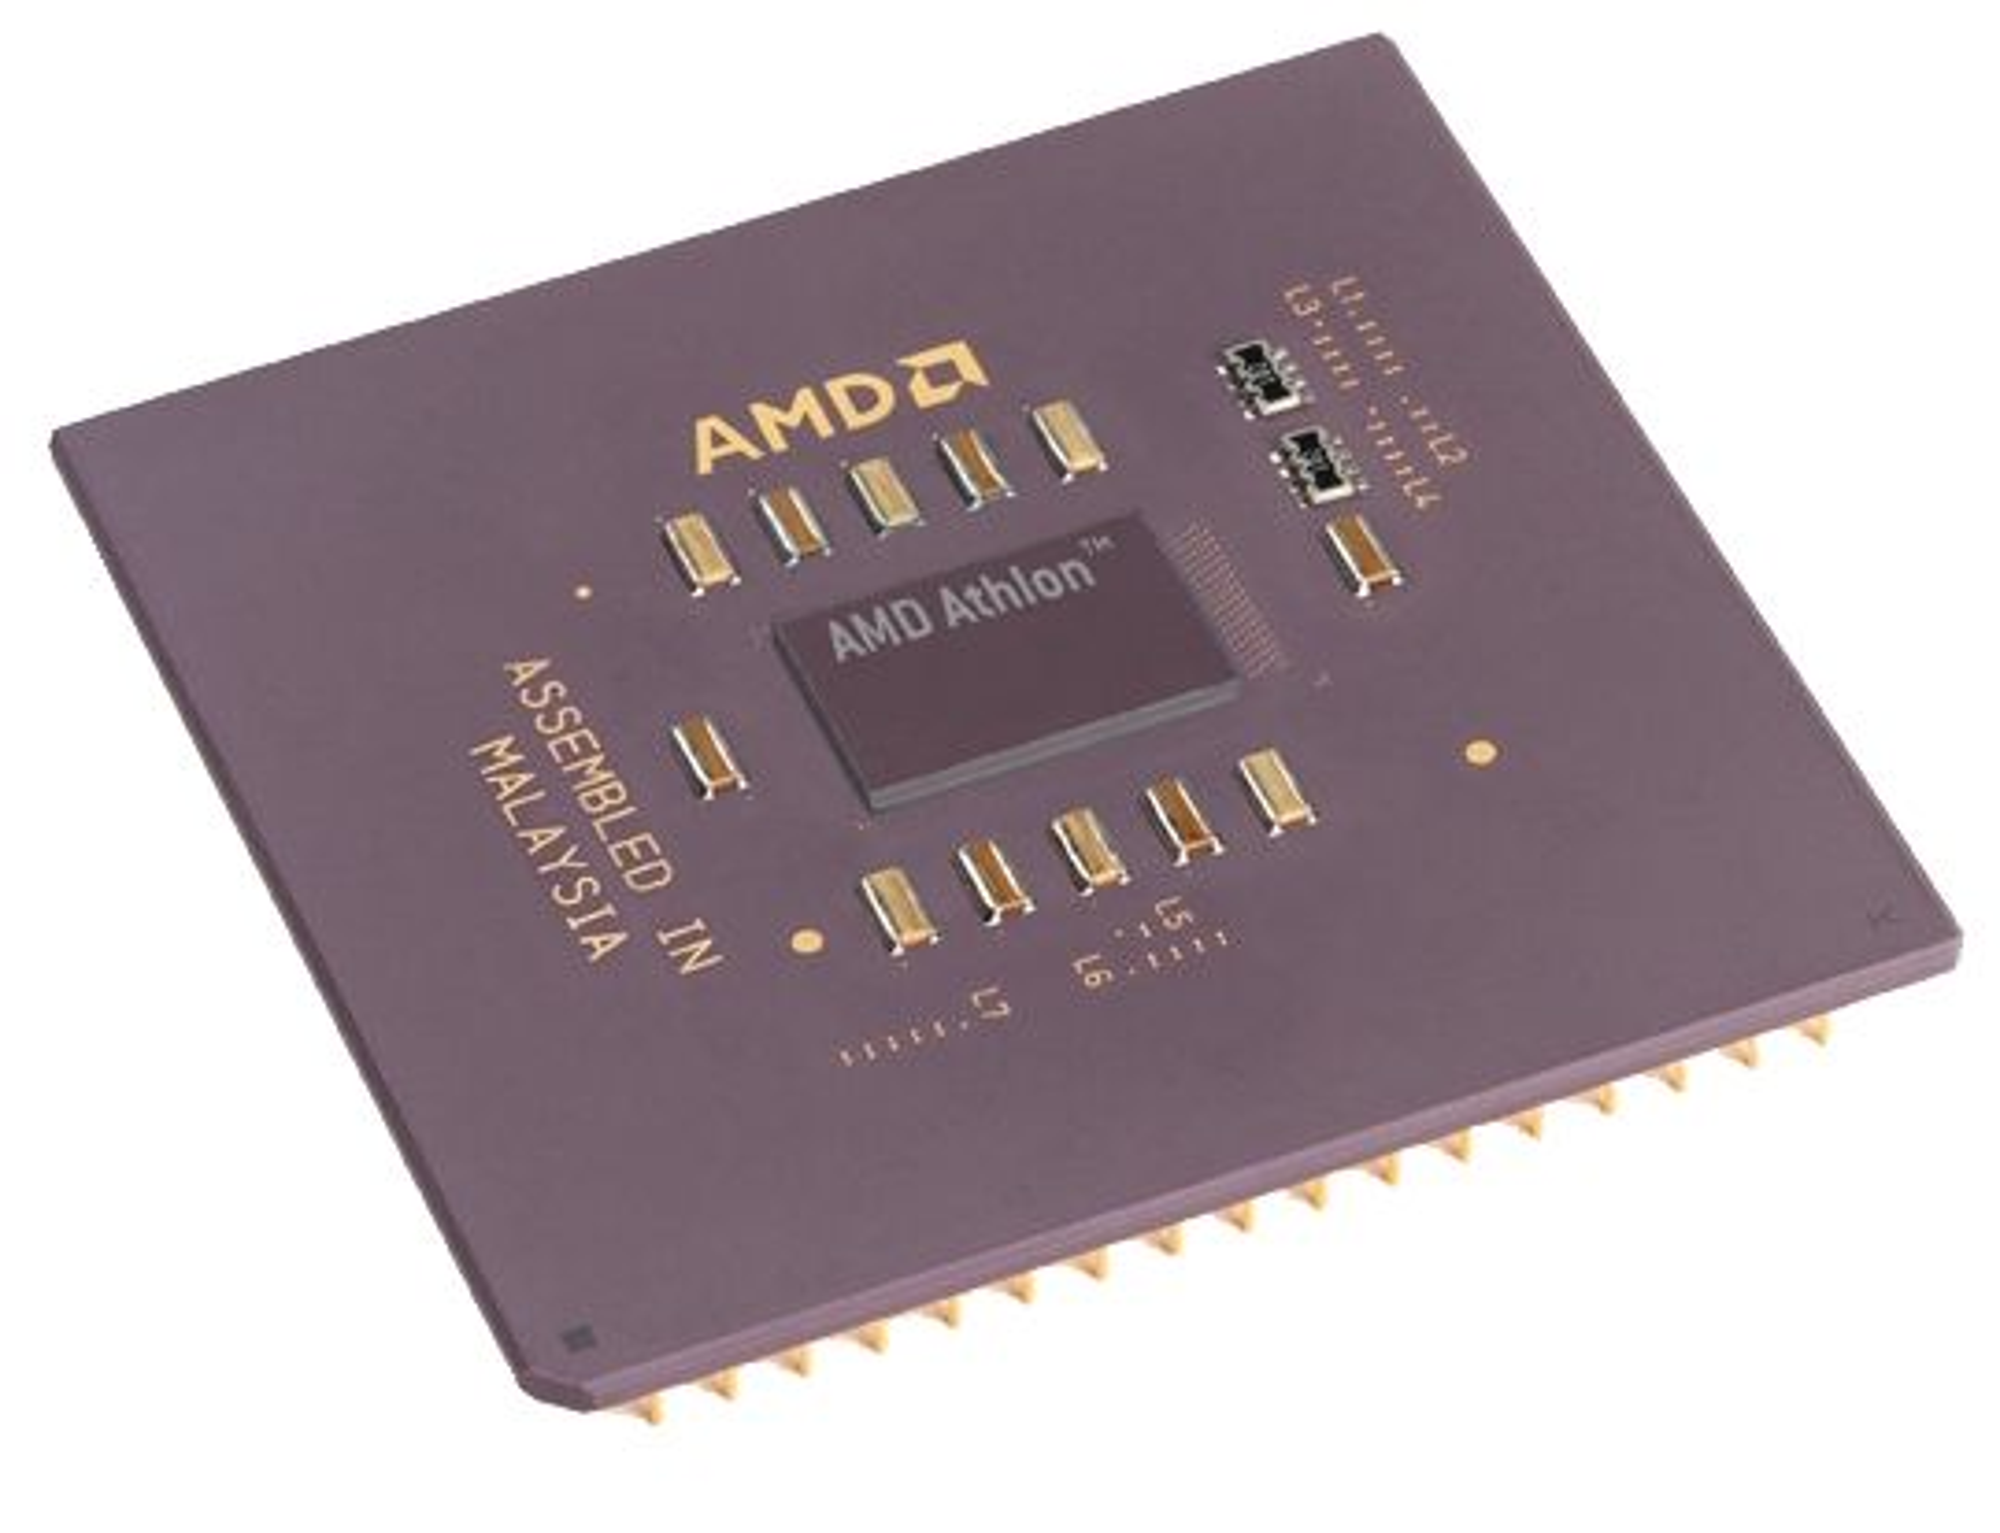 Gode, gamle AMD Athlon